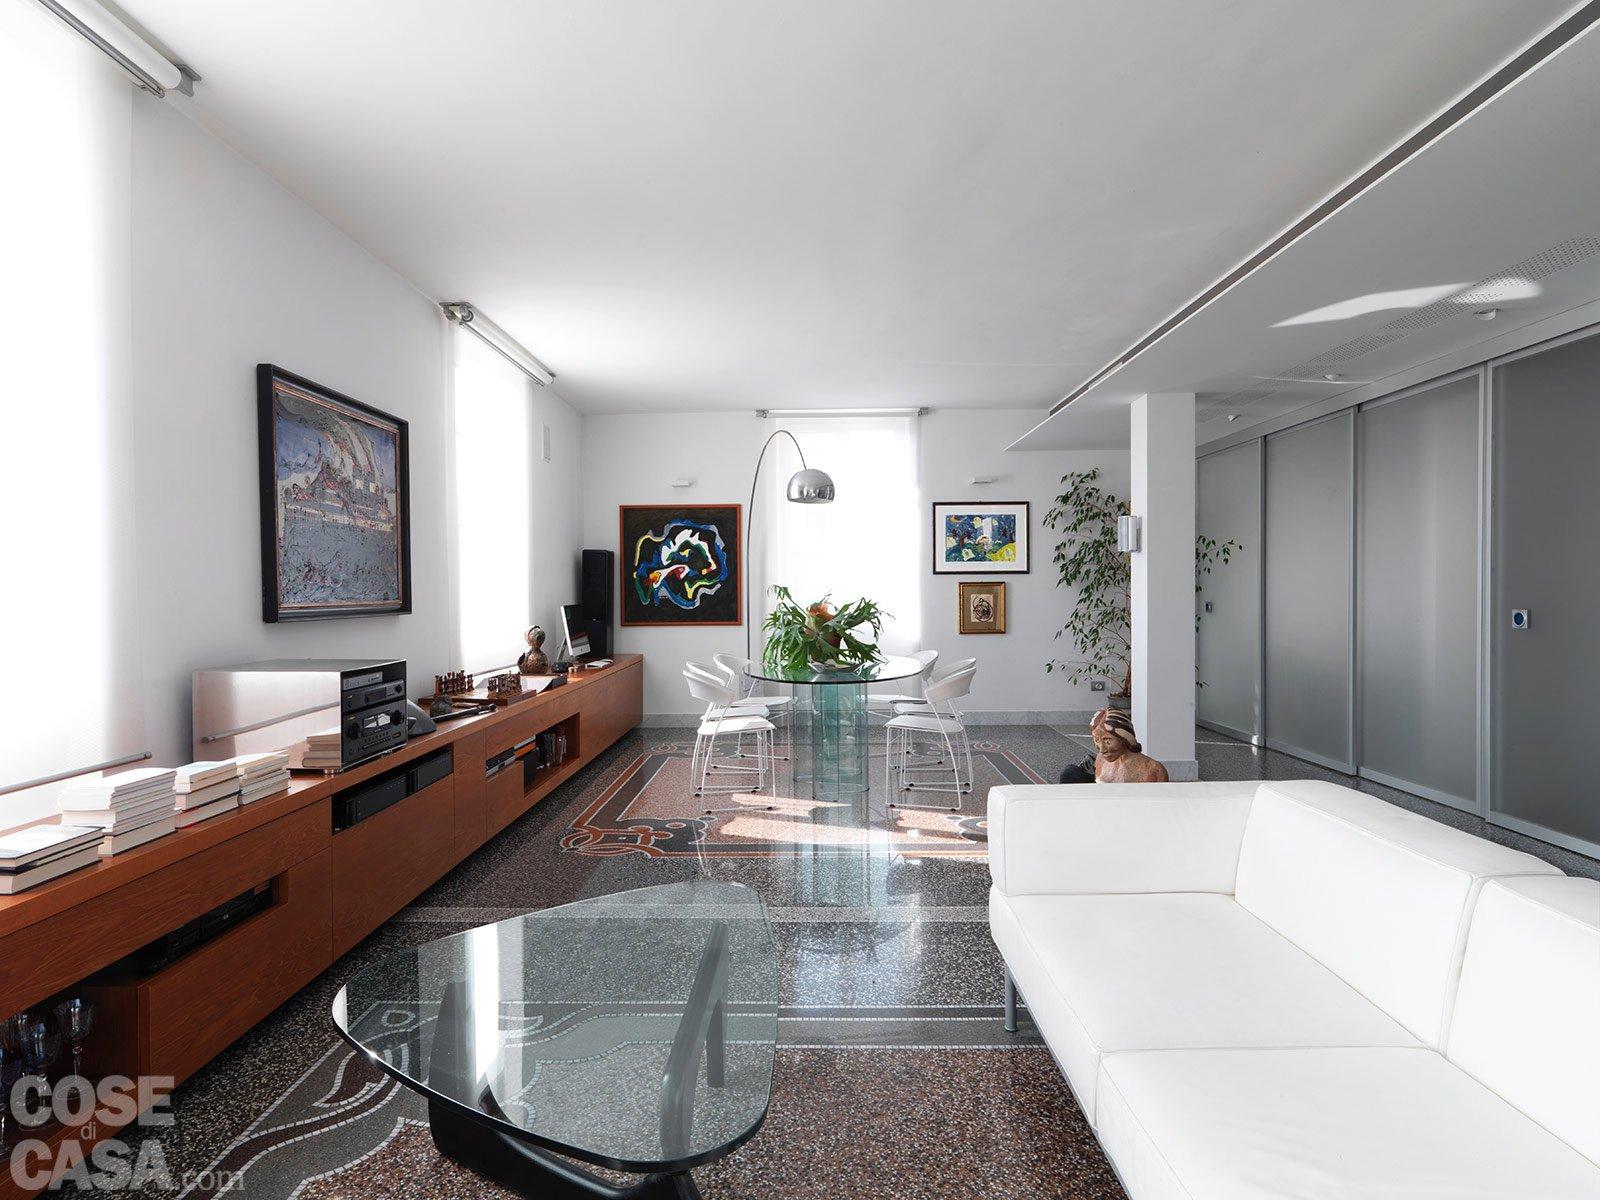 Casa soluzioni hi tech per interni anni 39 30 cose di casa - Pavimenti interni casa ...